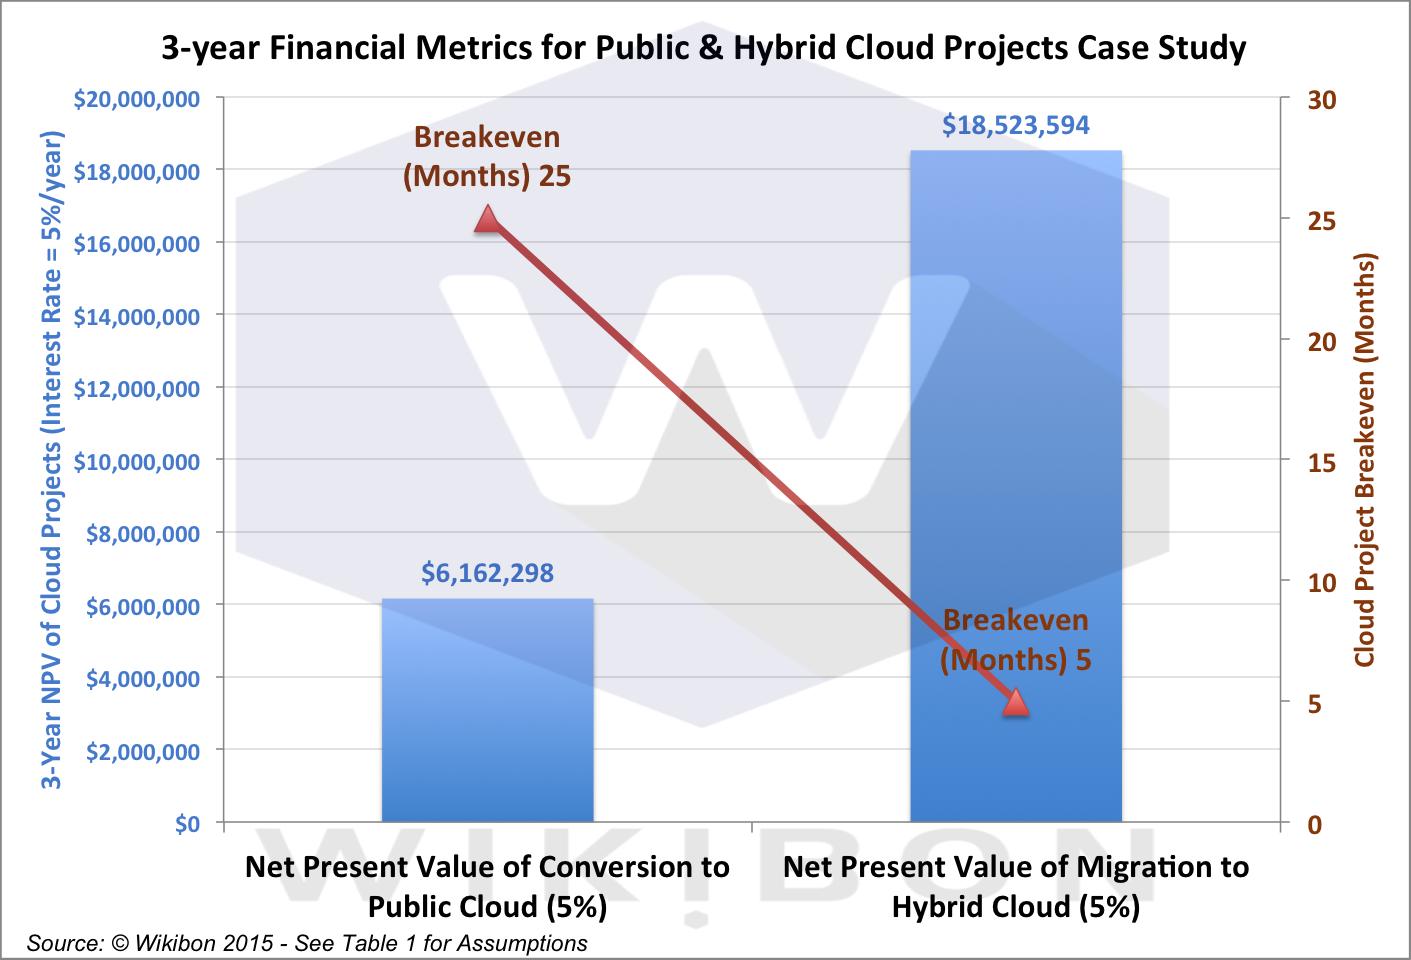 Strategic Comparison of Public Cloud versus Hybrid Cloud